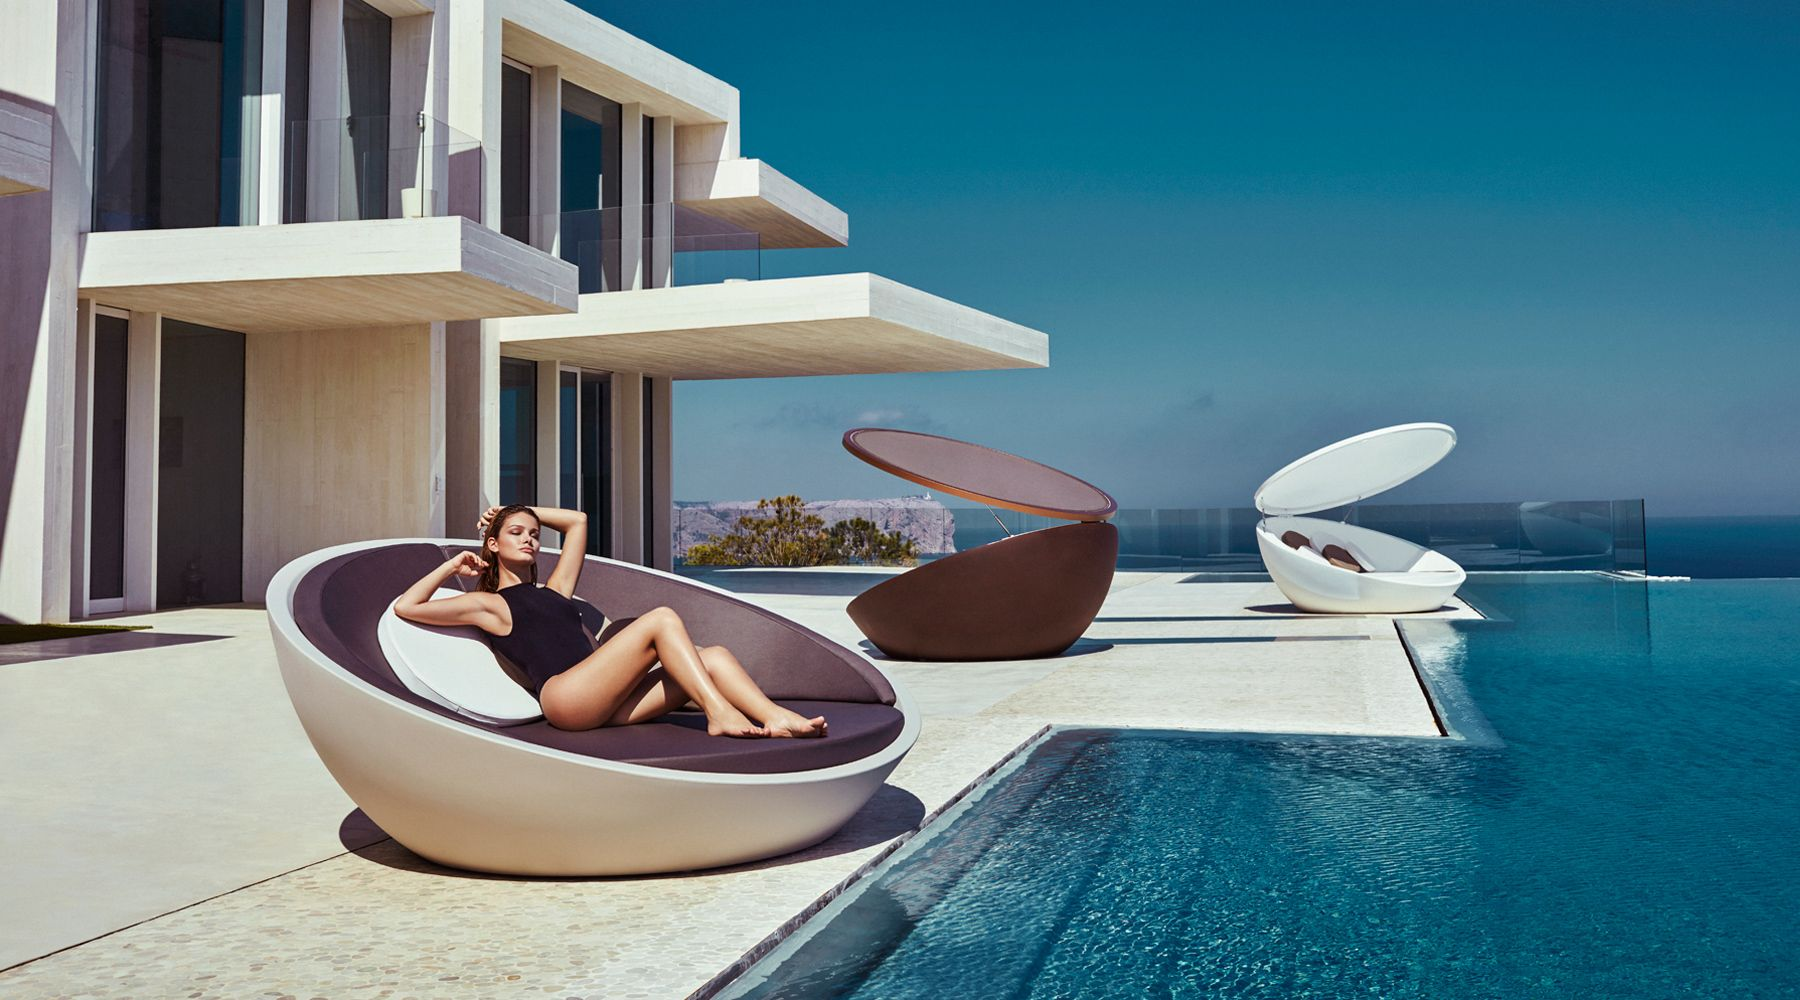 VONDOM Is A Leader Company Of Avant Garde Outdoor Furniture, Pots, Planters,